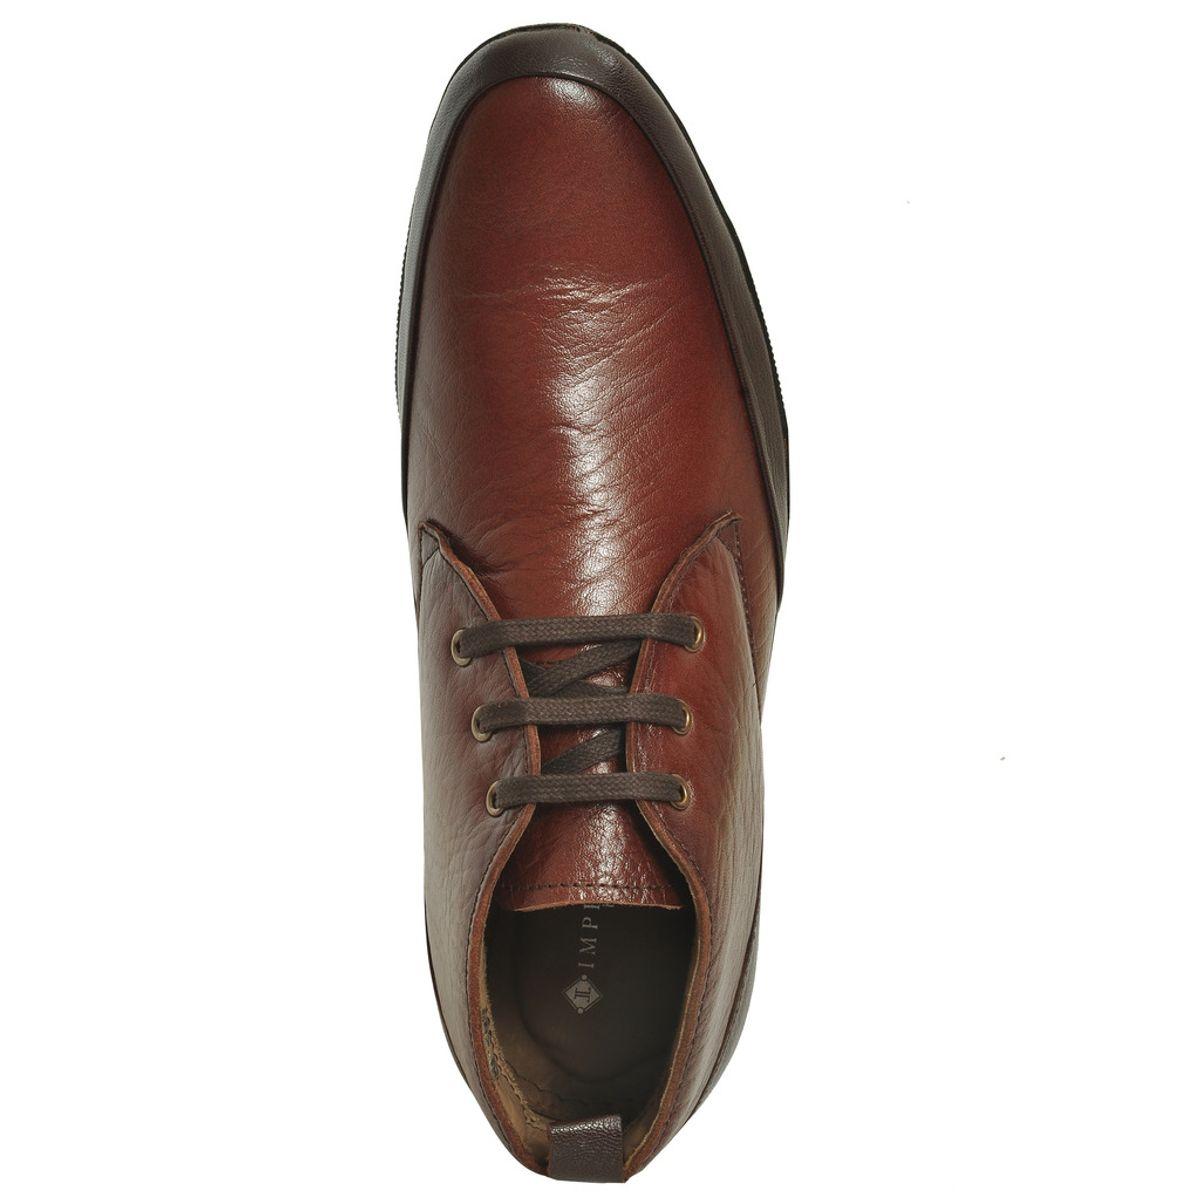 Imperio Men s Formal Shoes - Brown Tan